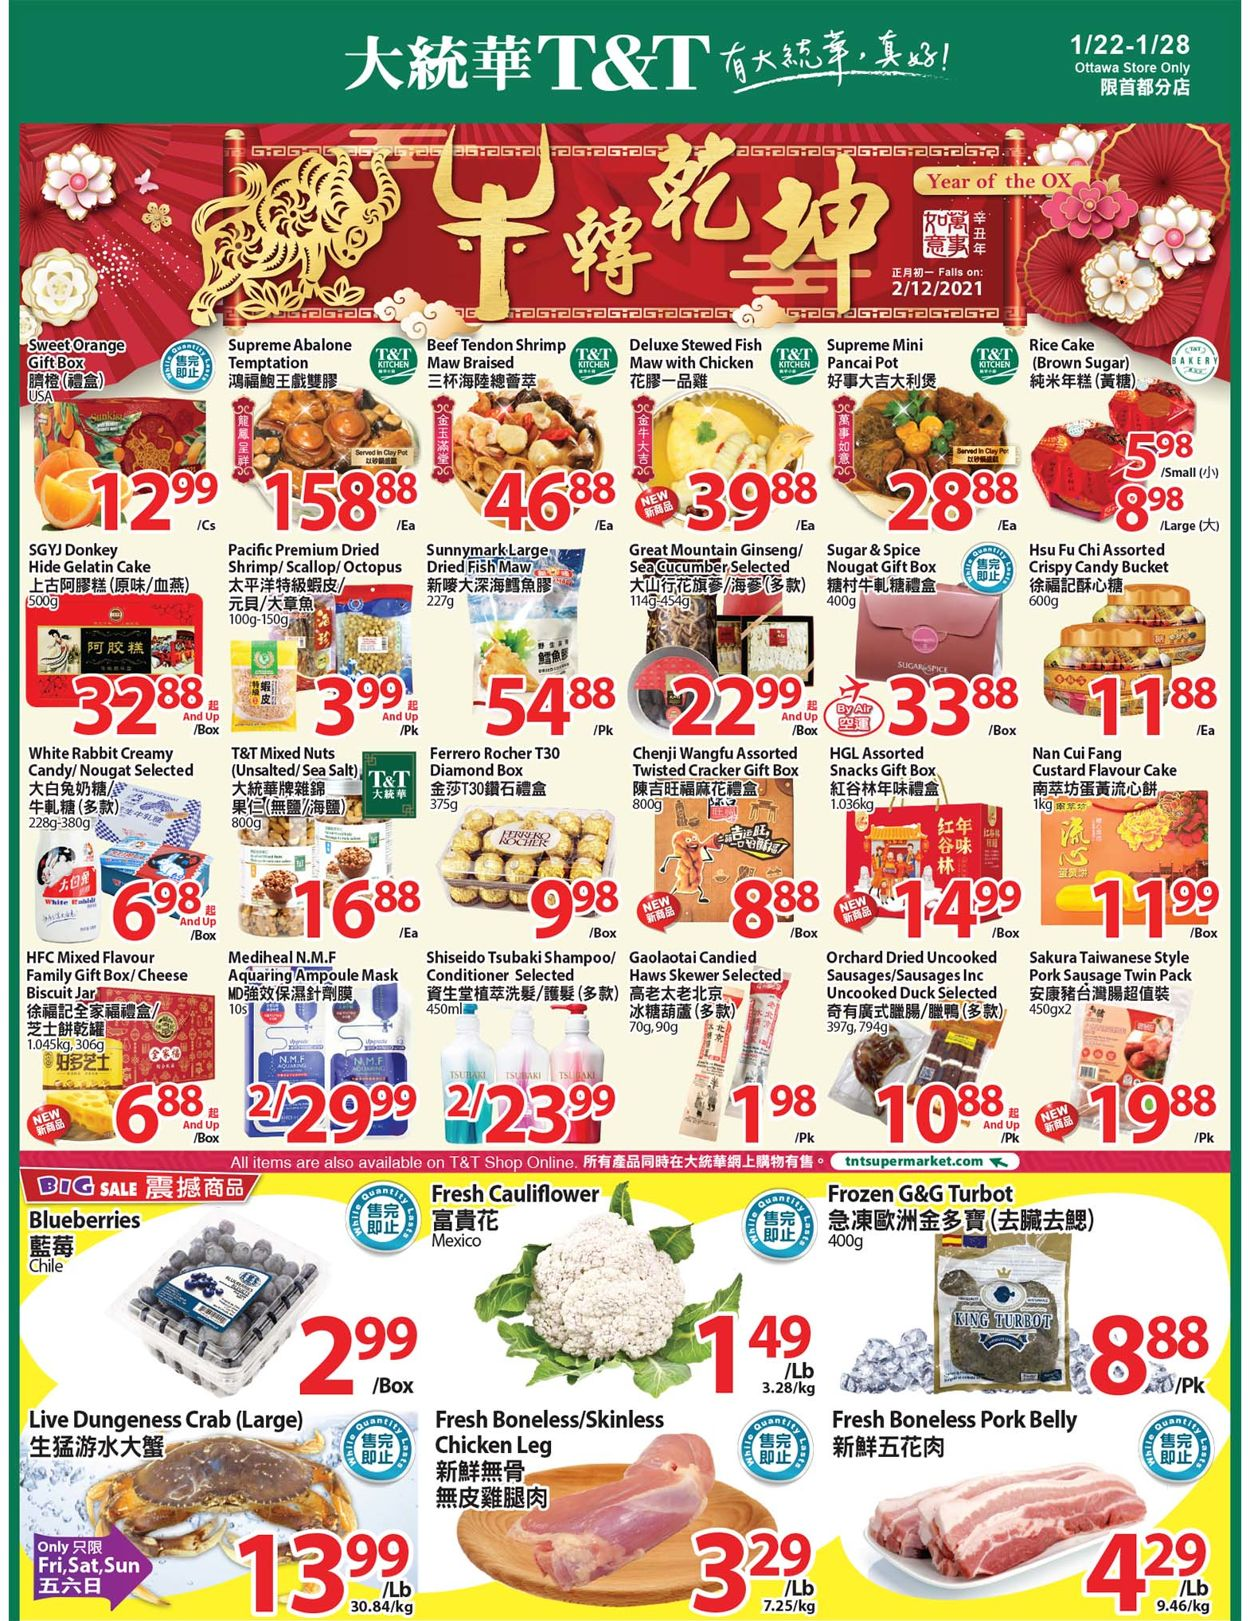 T&T Supermarket - Ottawa Flyer - 01/22-01/28/2021